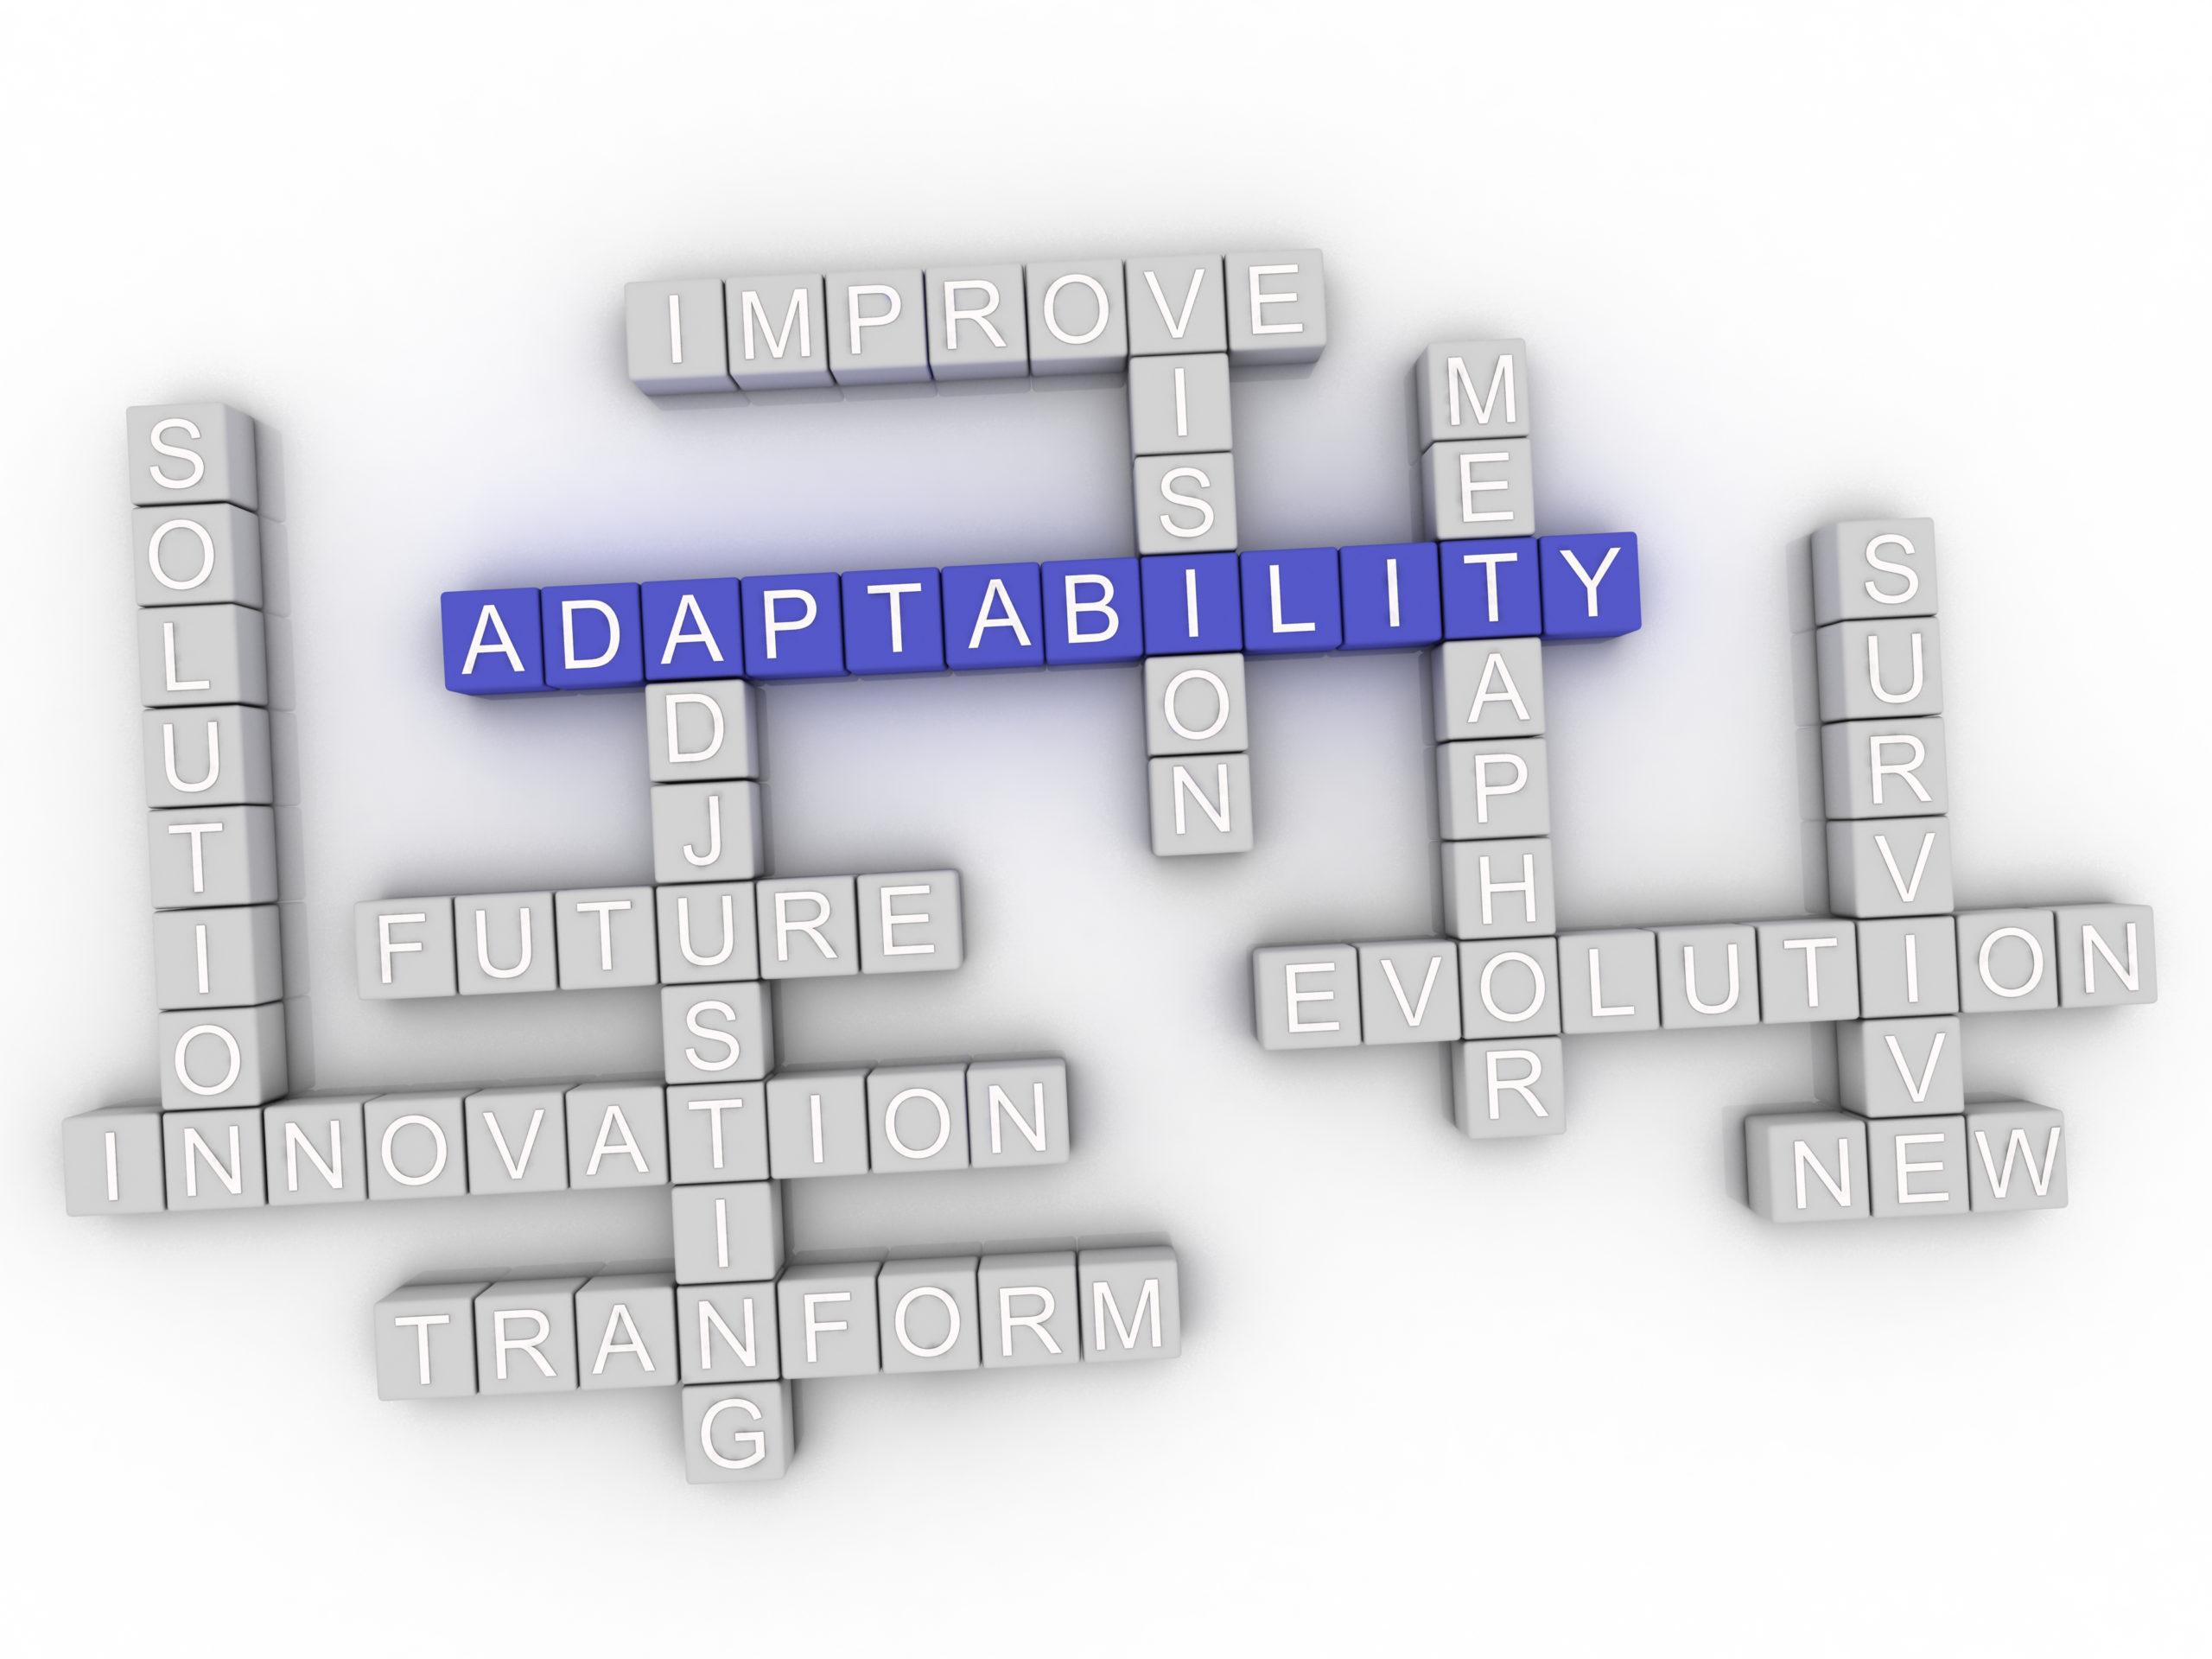 Prepare to Adapt Business